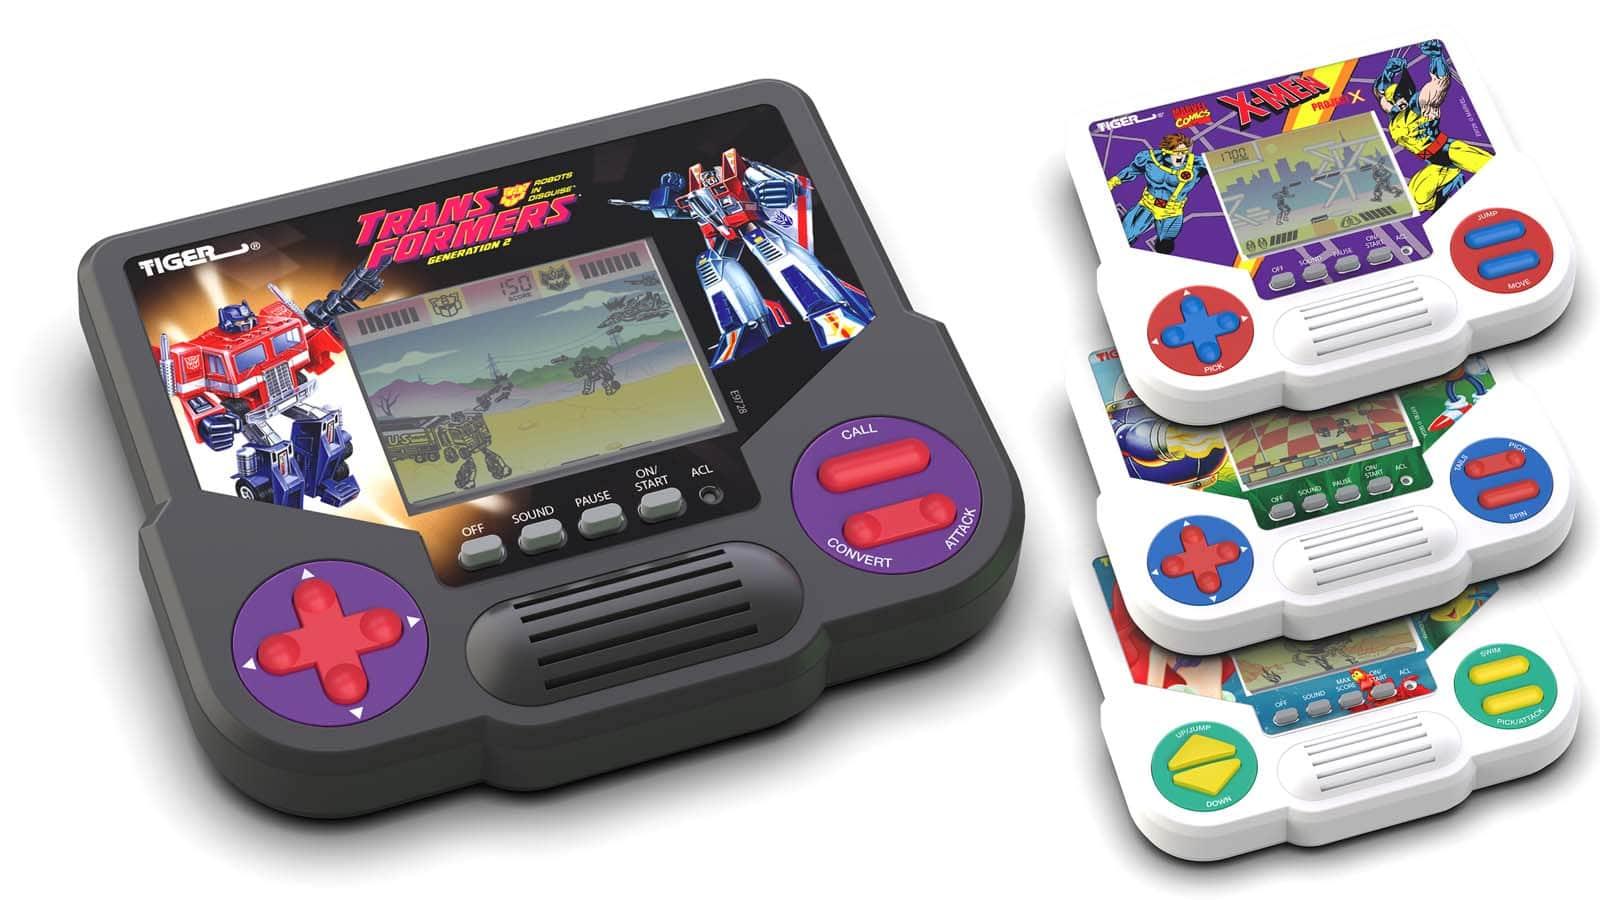 tiger sonic 3 tiger handheld games